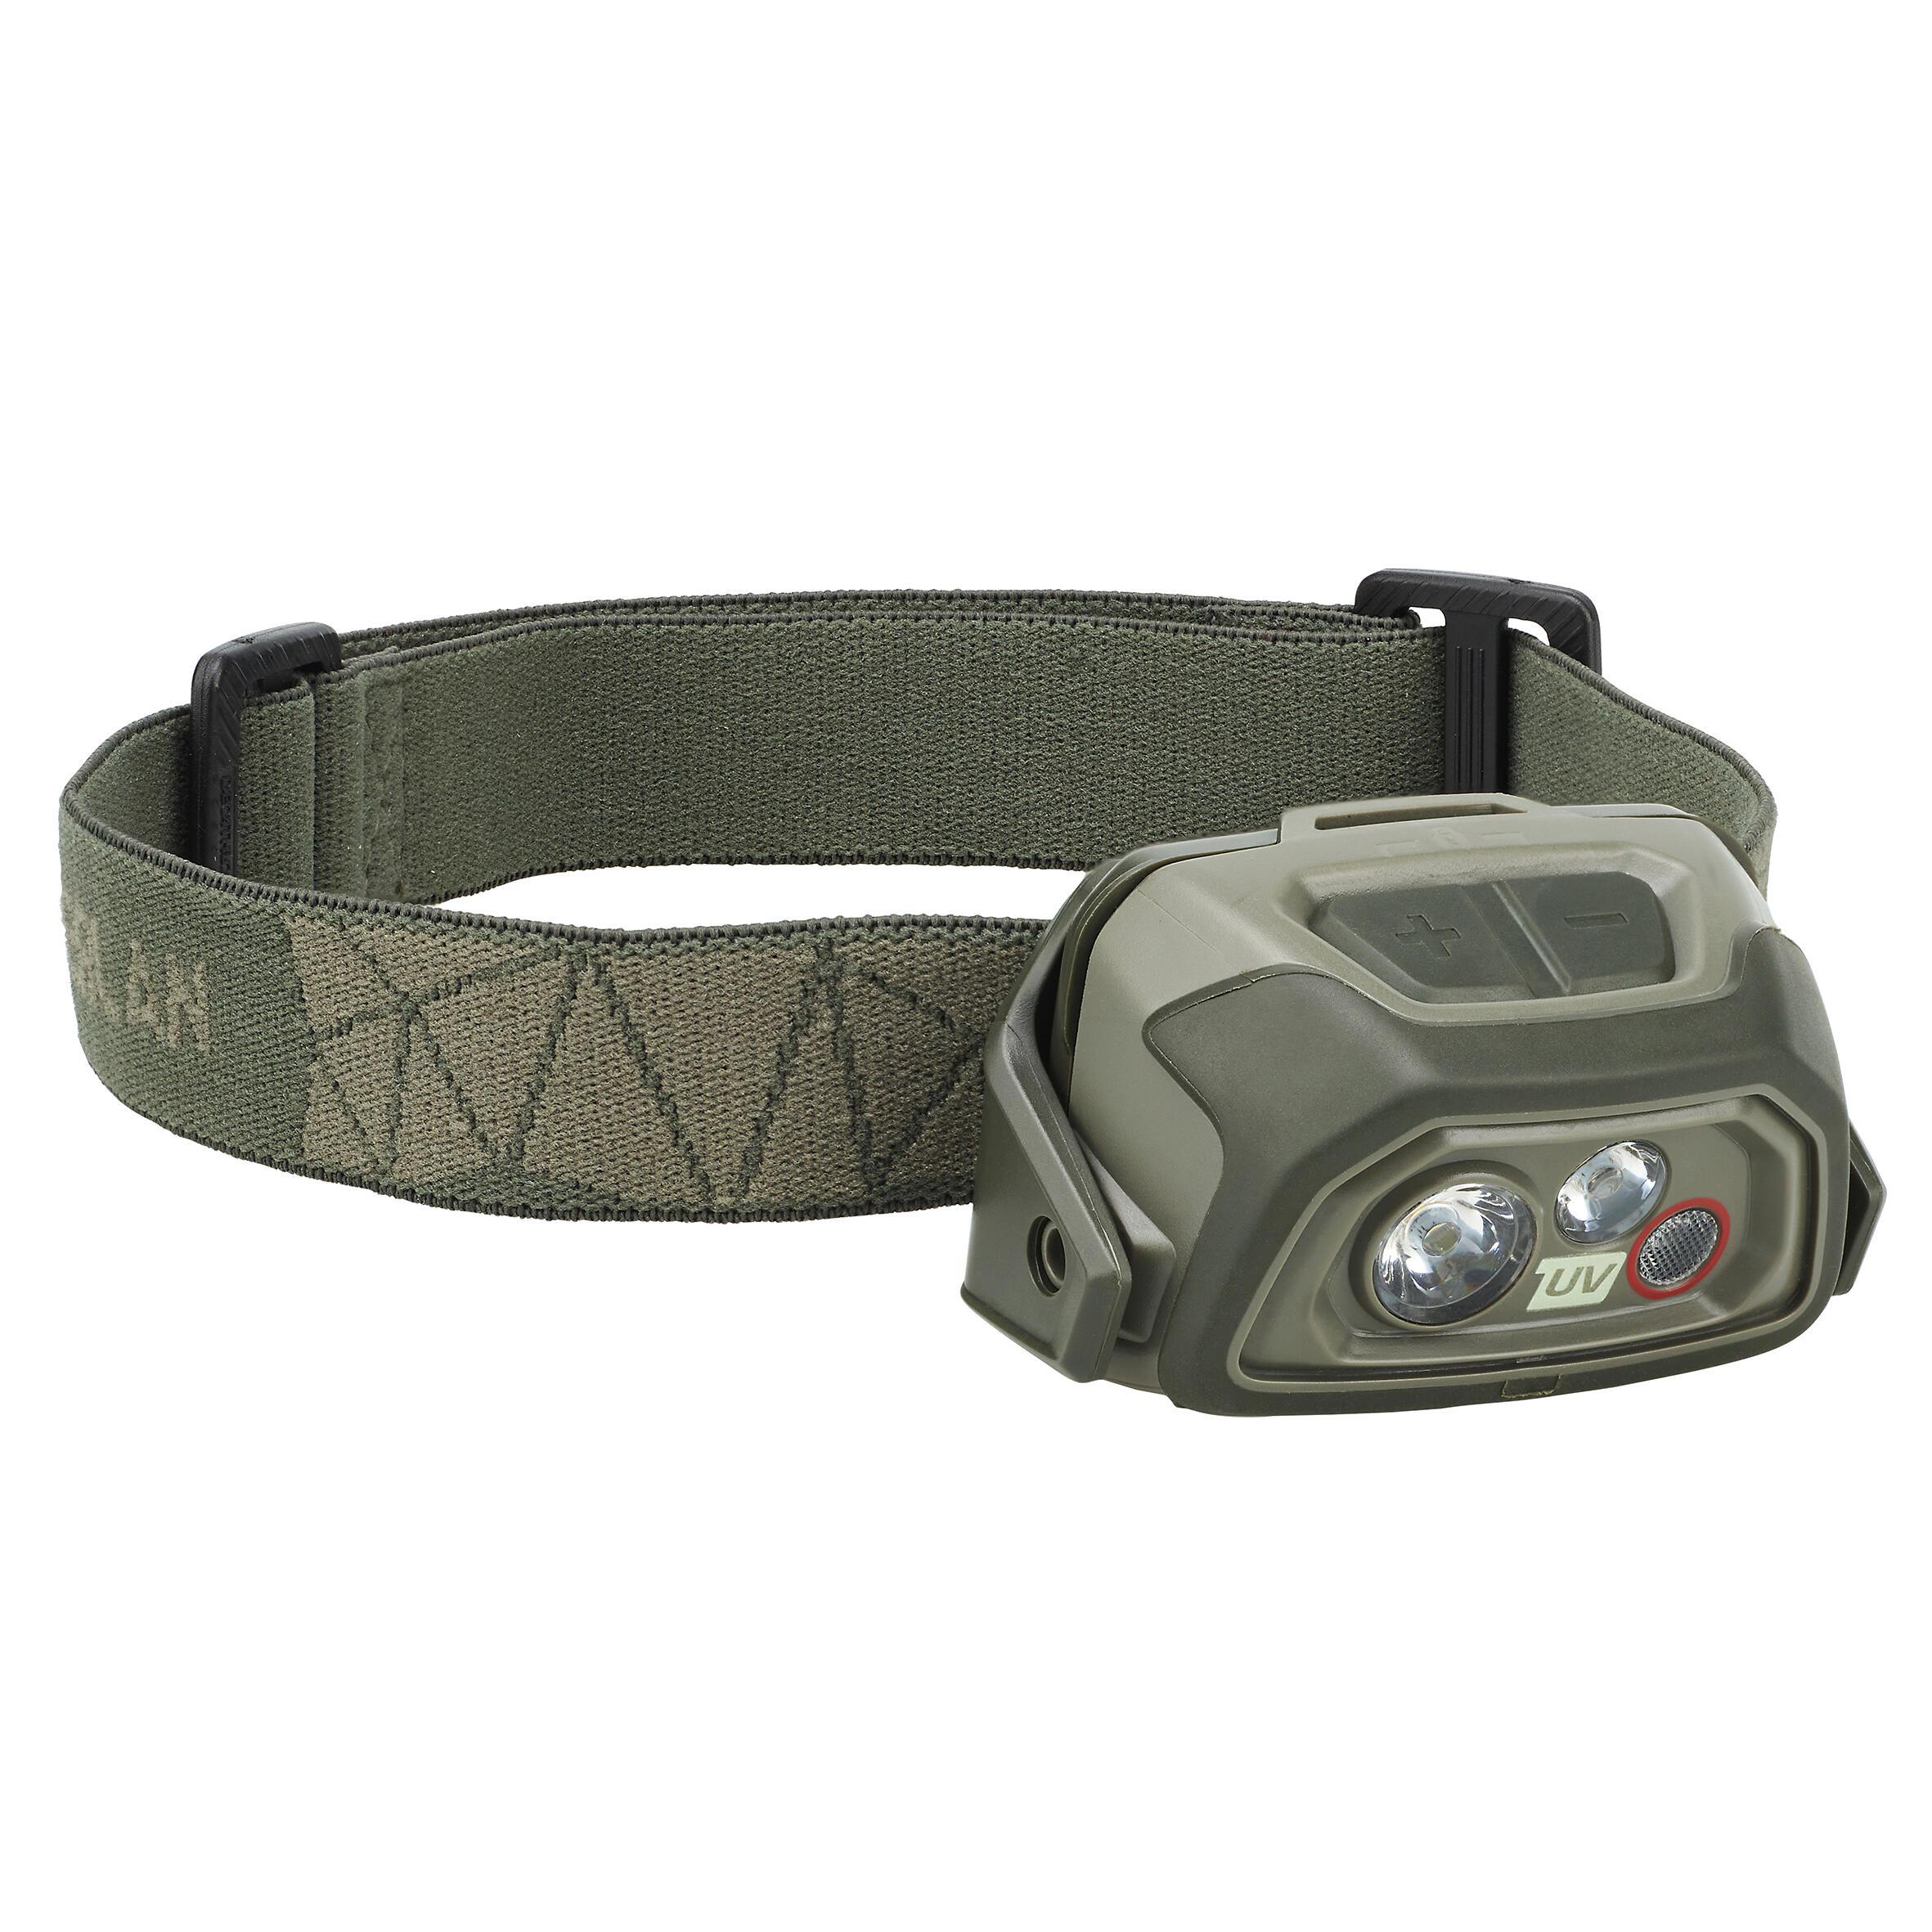 Lanternă Frontală MOONLIGHT900 imagine